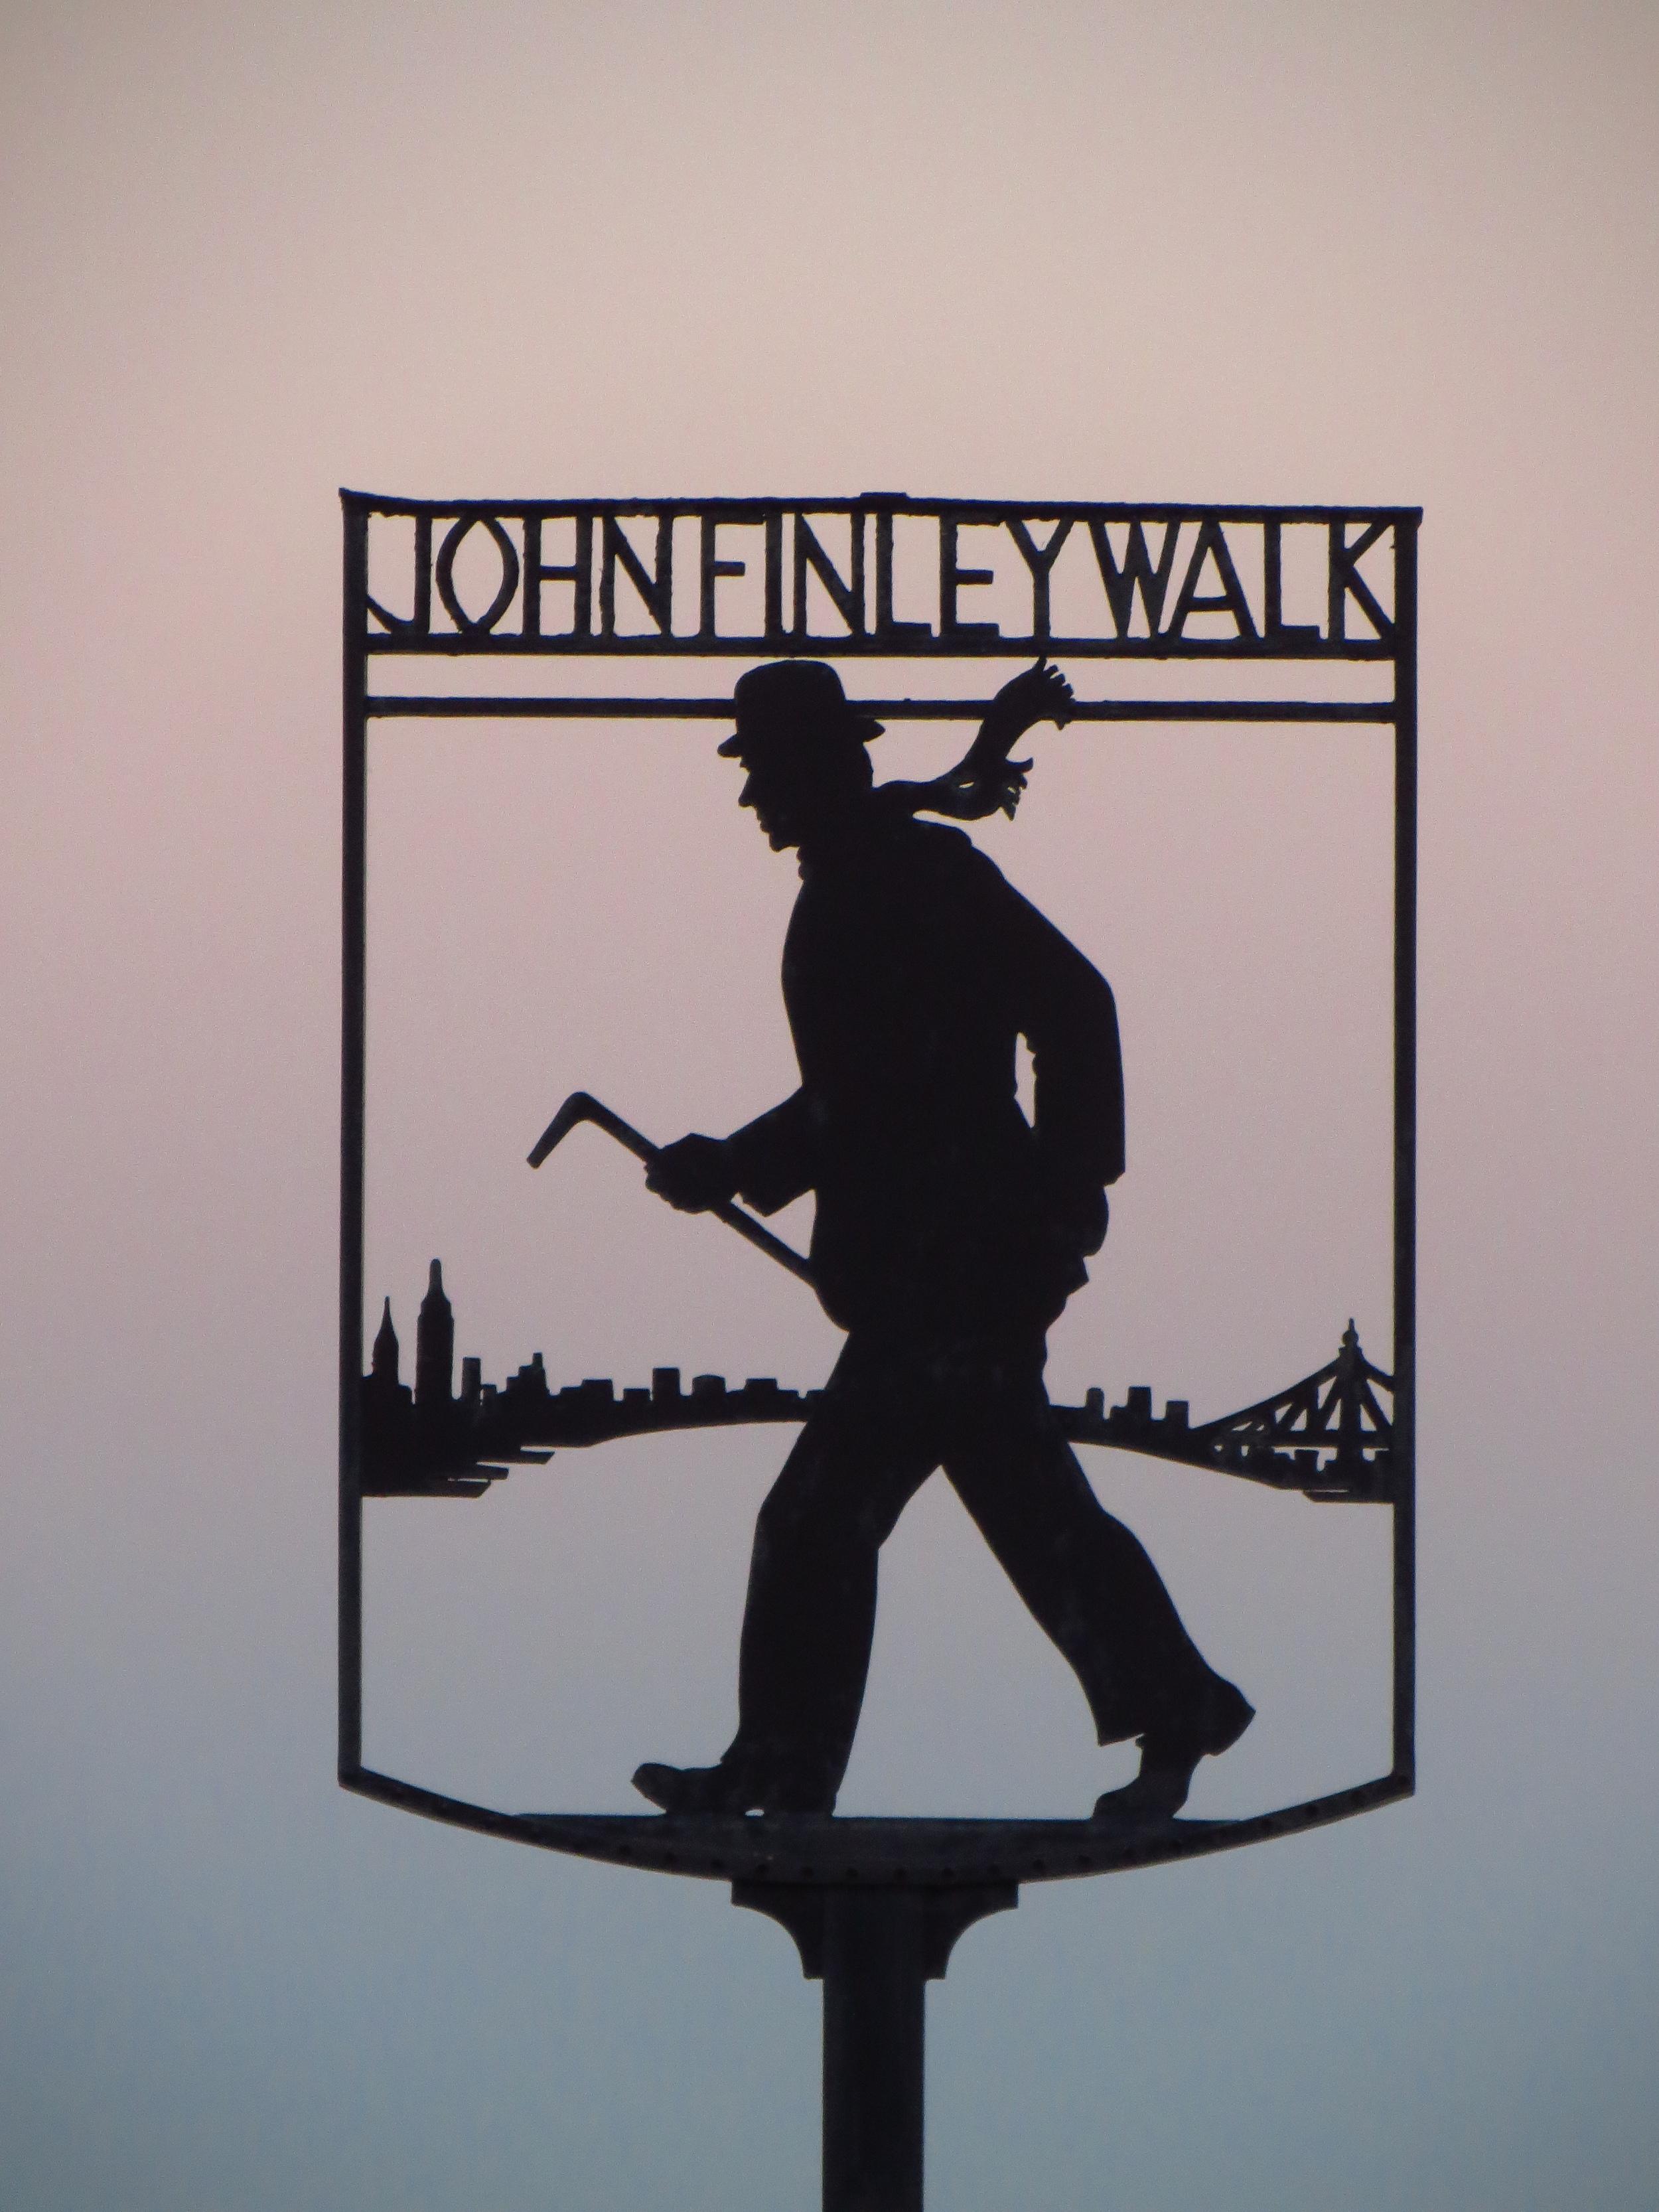 John Finley Walk in Carl Schurz Park